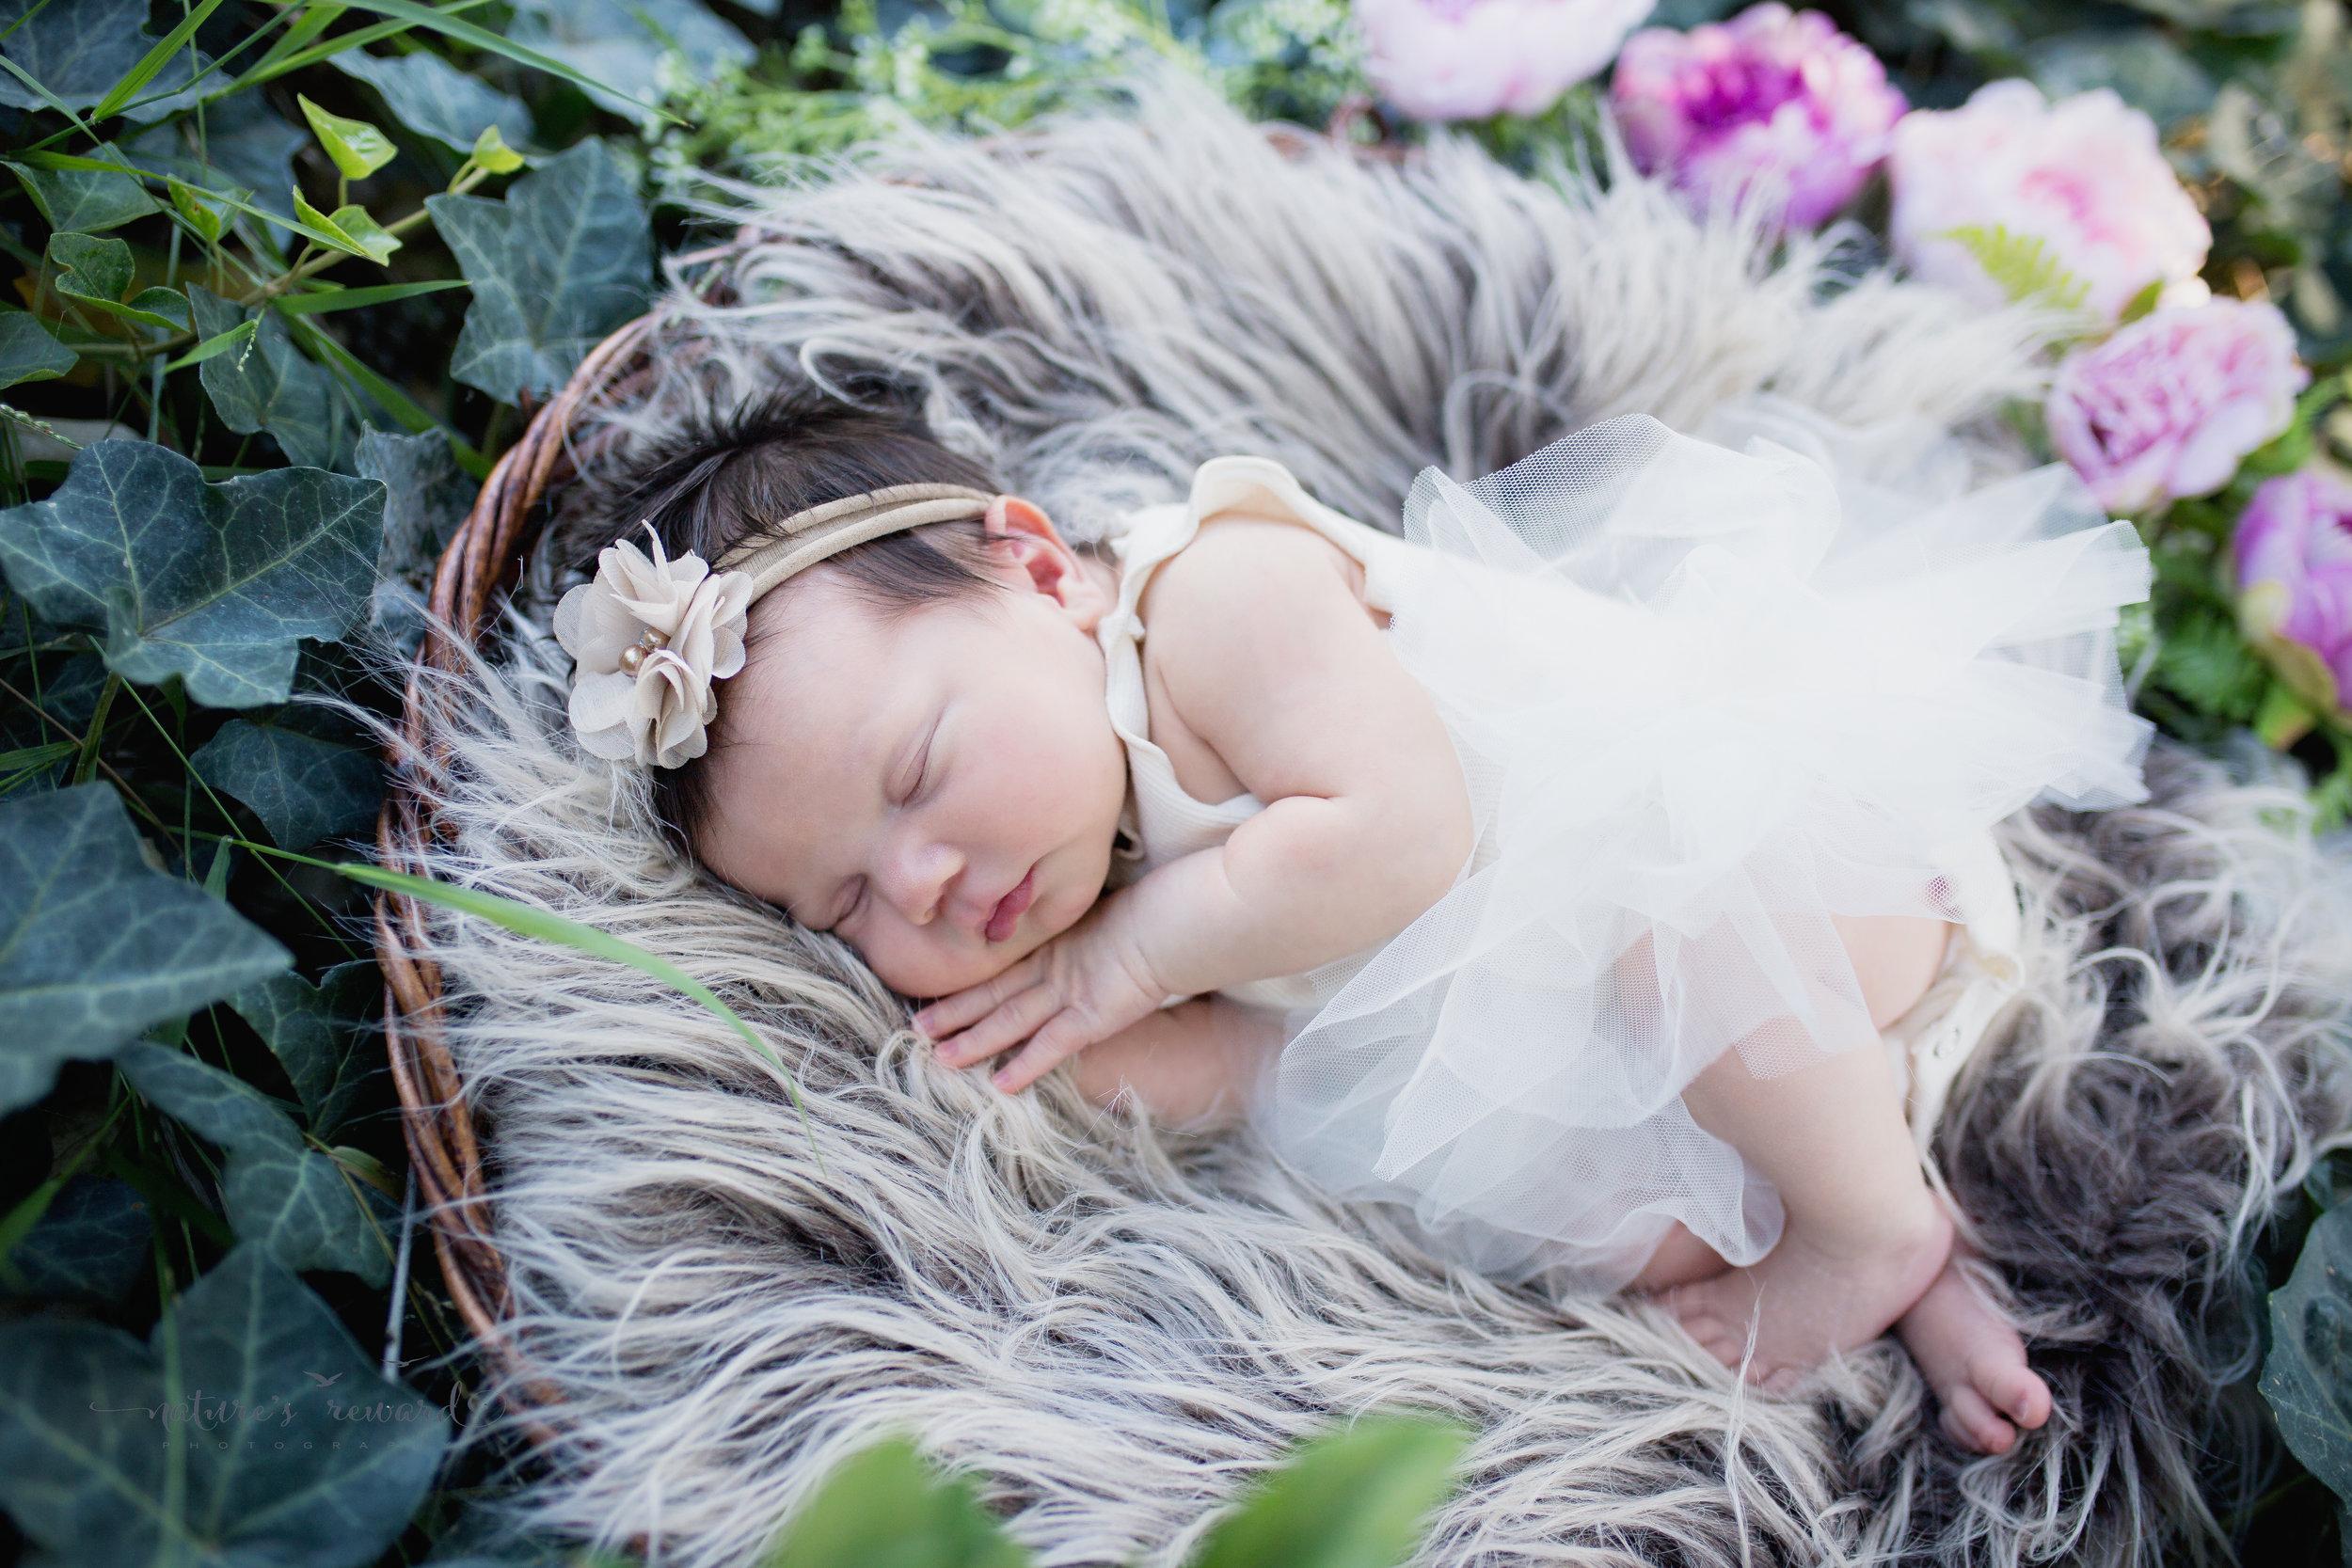 In the ivy garden she sleeps